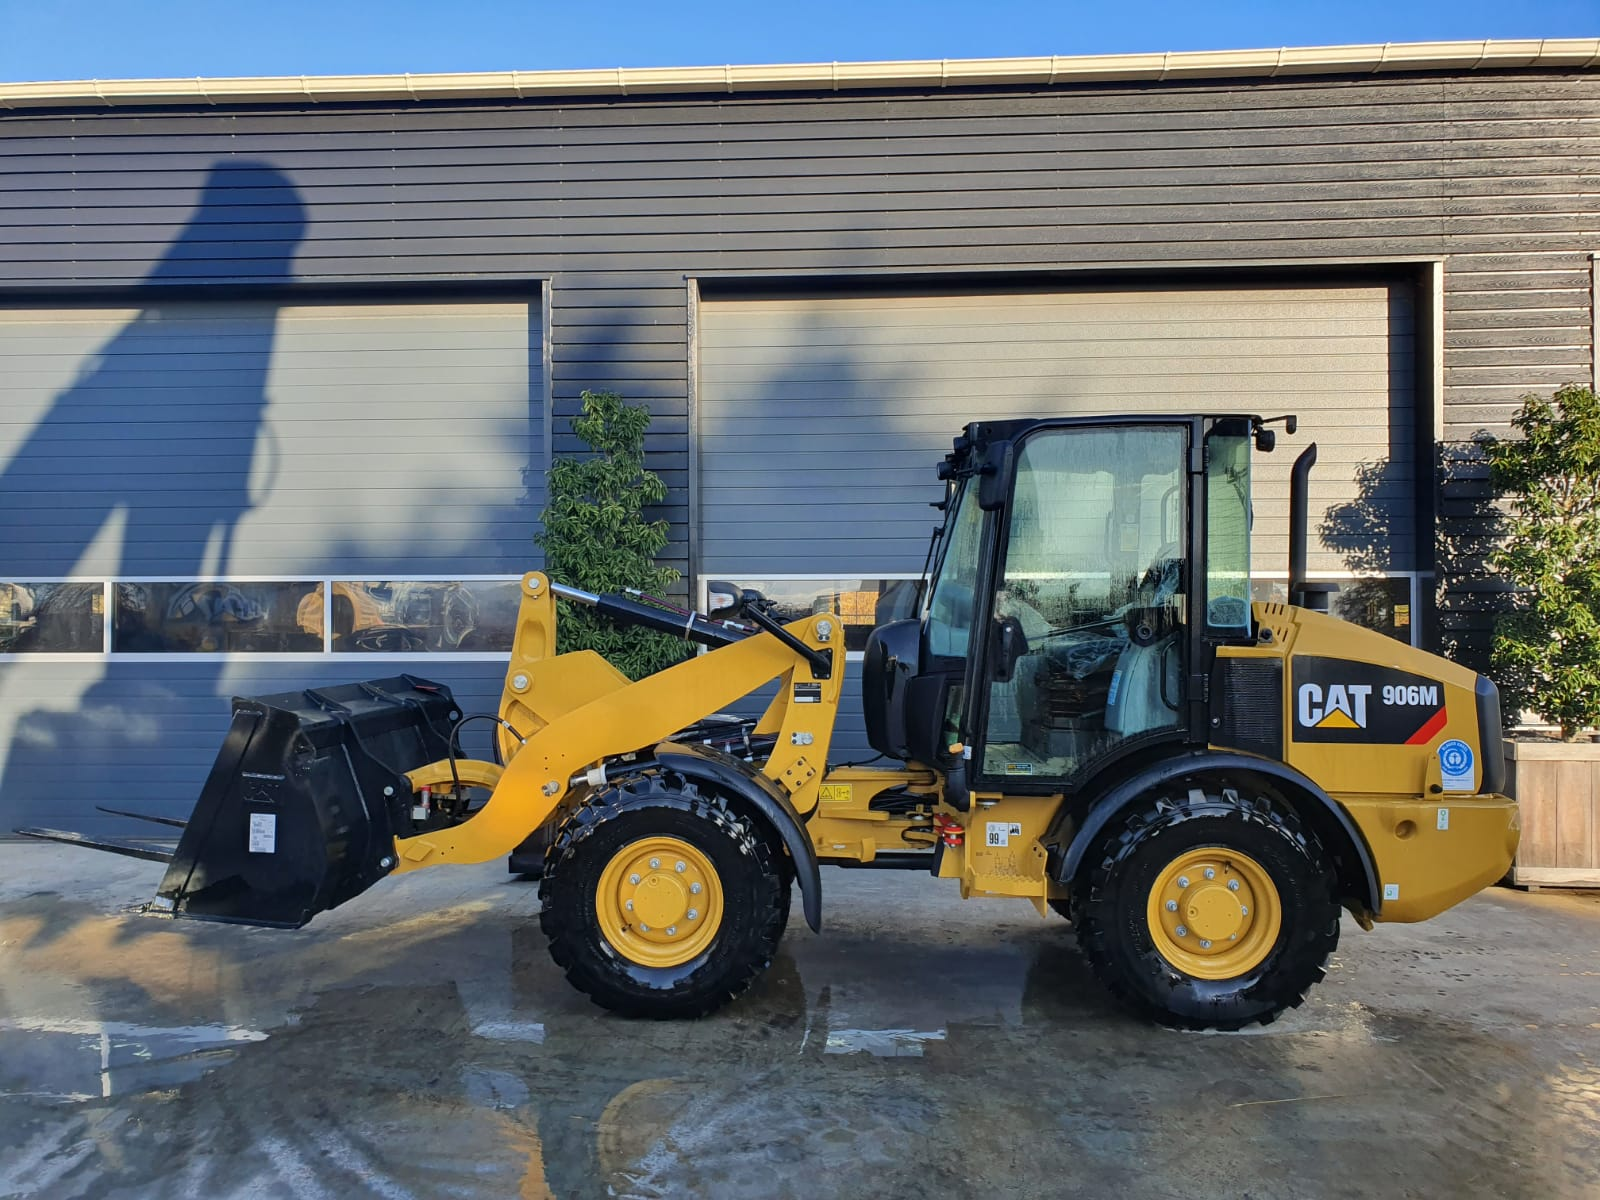 Caterpillar 906M Wheel loader